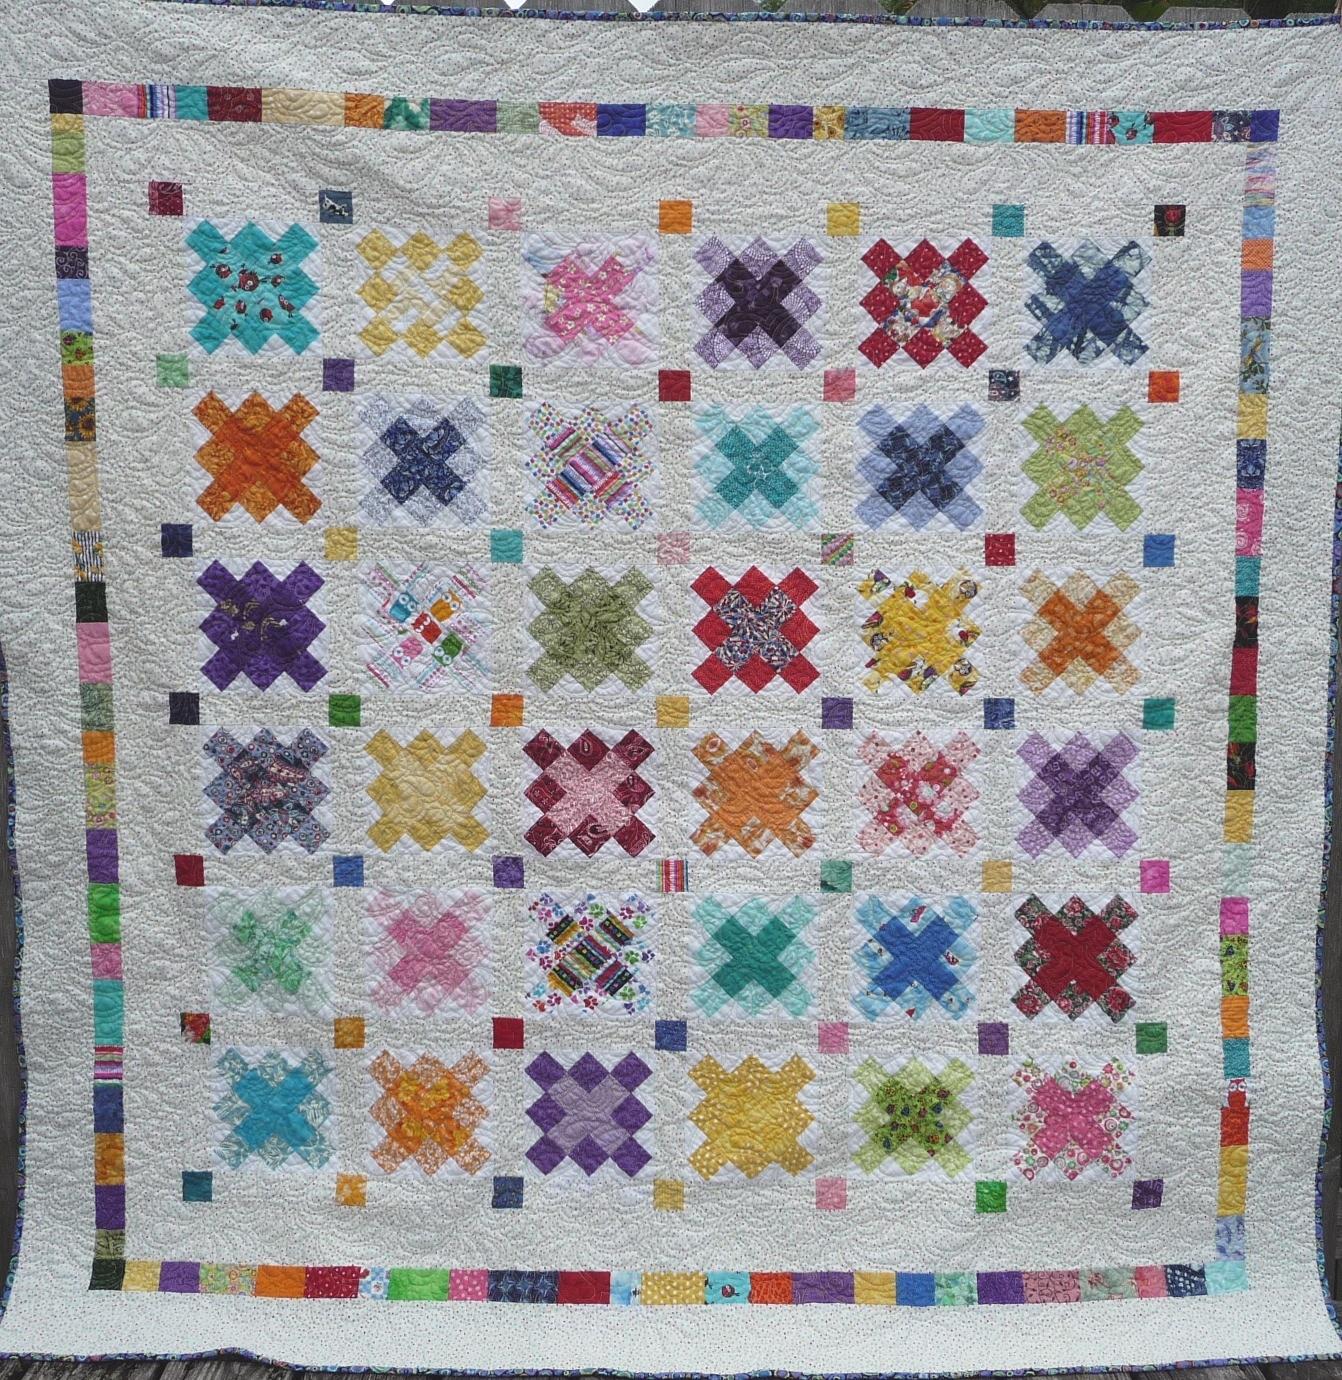 Quilting on the crescent rainbow scrap quilt 1 0 for Scrap quilt